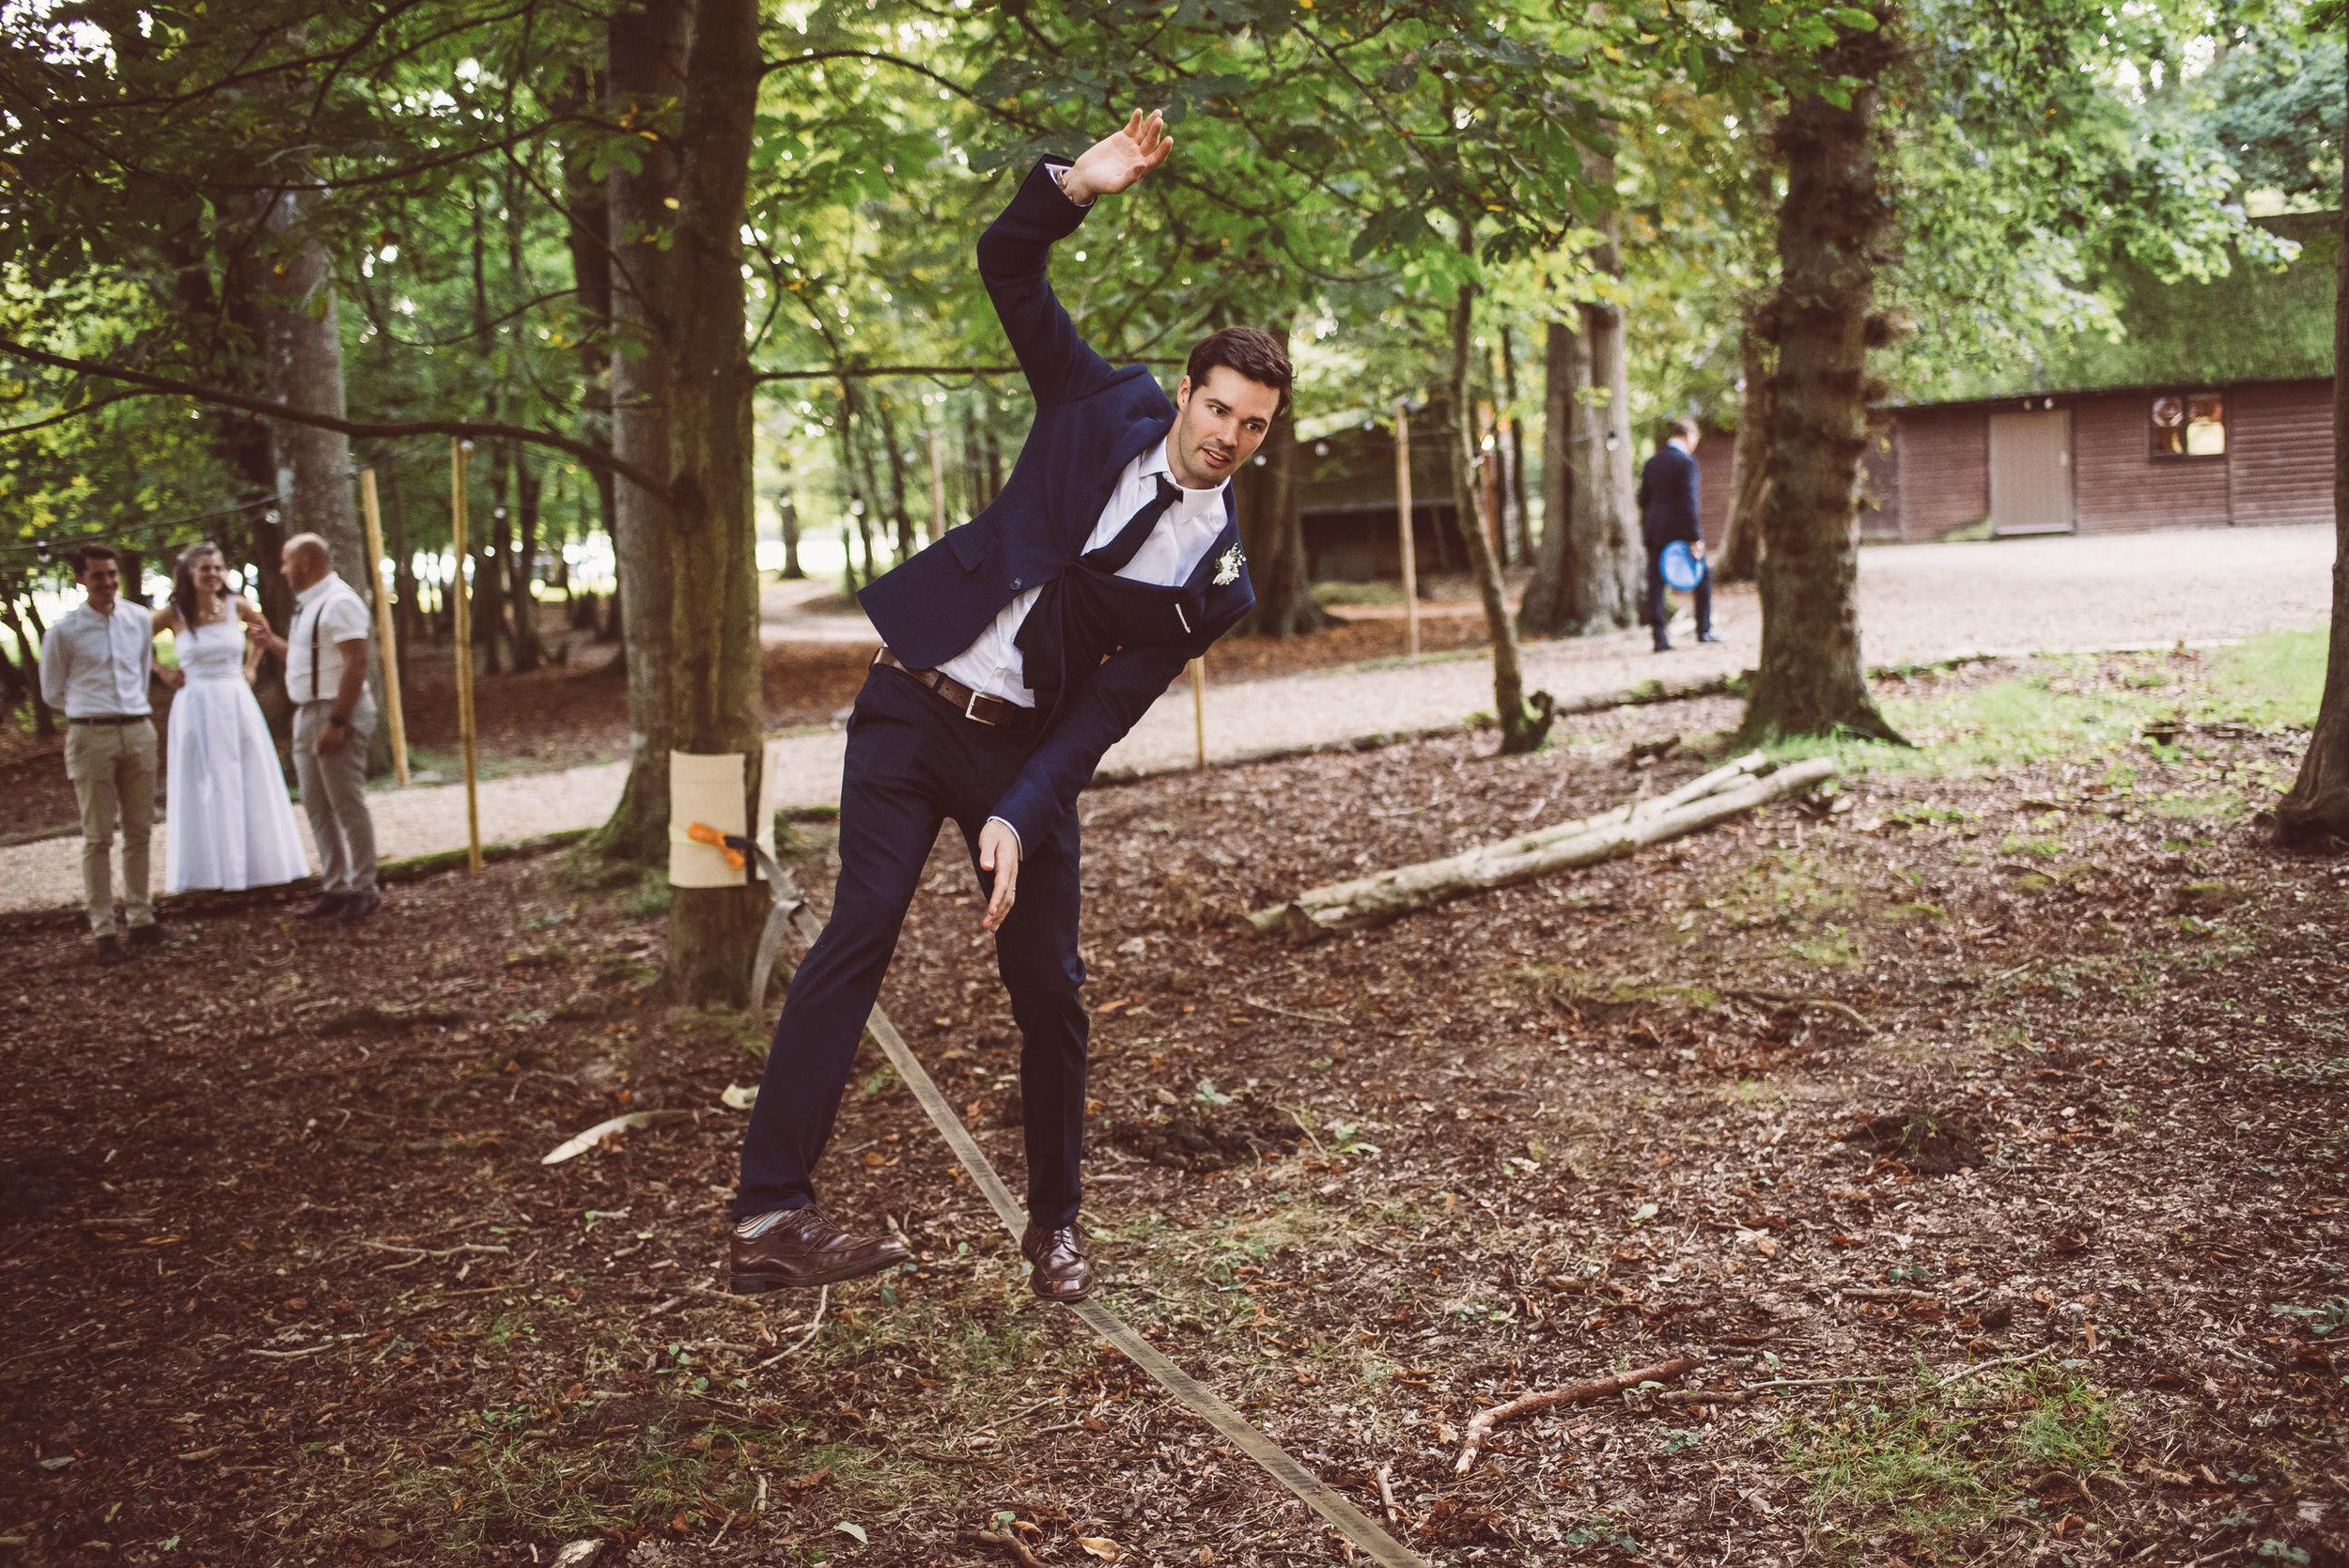 knepp-castle-boho-outdoor-wedding-444.jpg